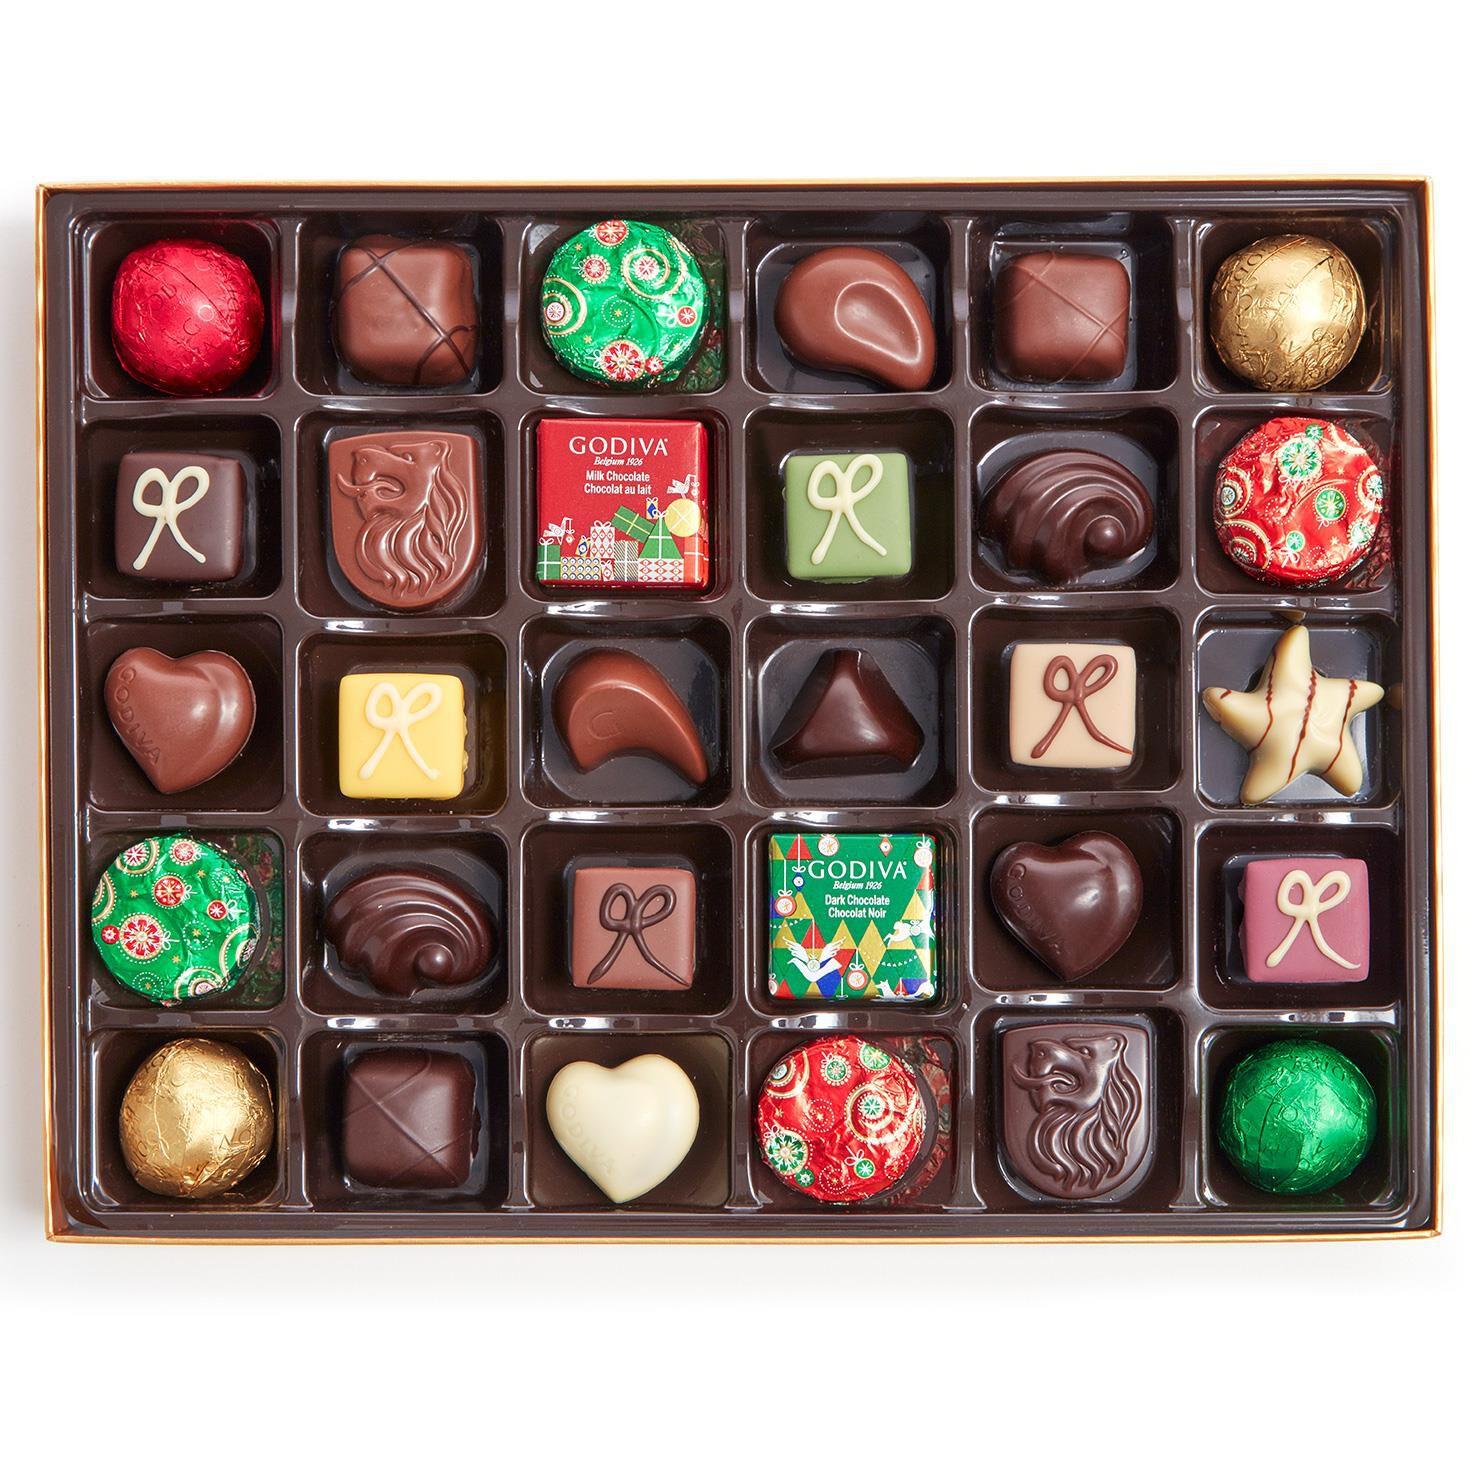 Candy & Chocolate | Hallmark